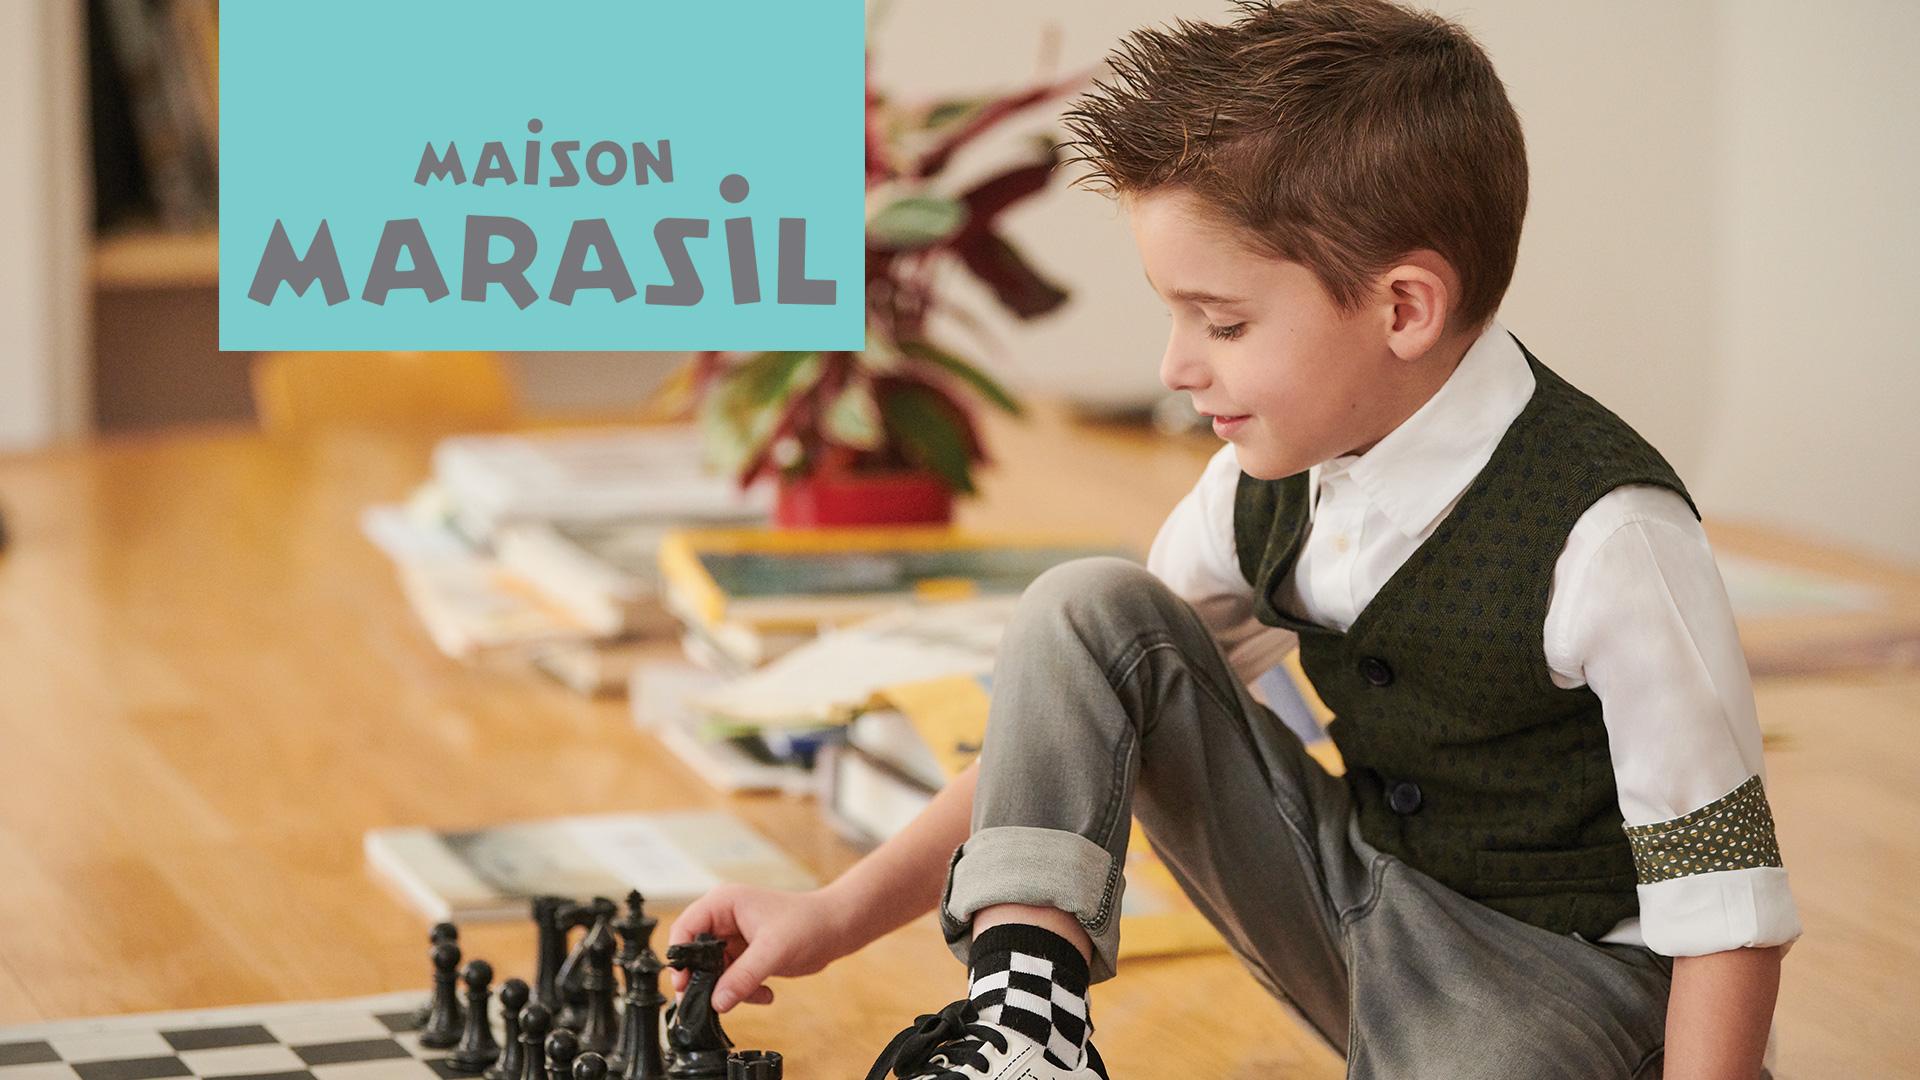 d5b7d28bba Maison Marasil New Collection AW2018-19 - Mediterranean COSMOS mall